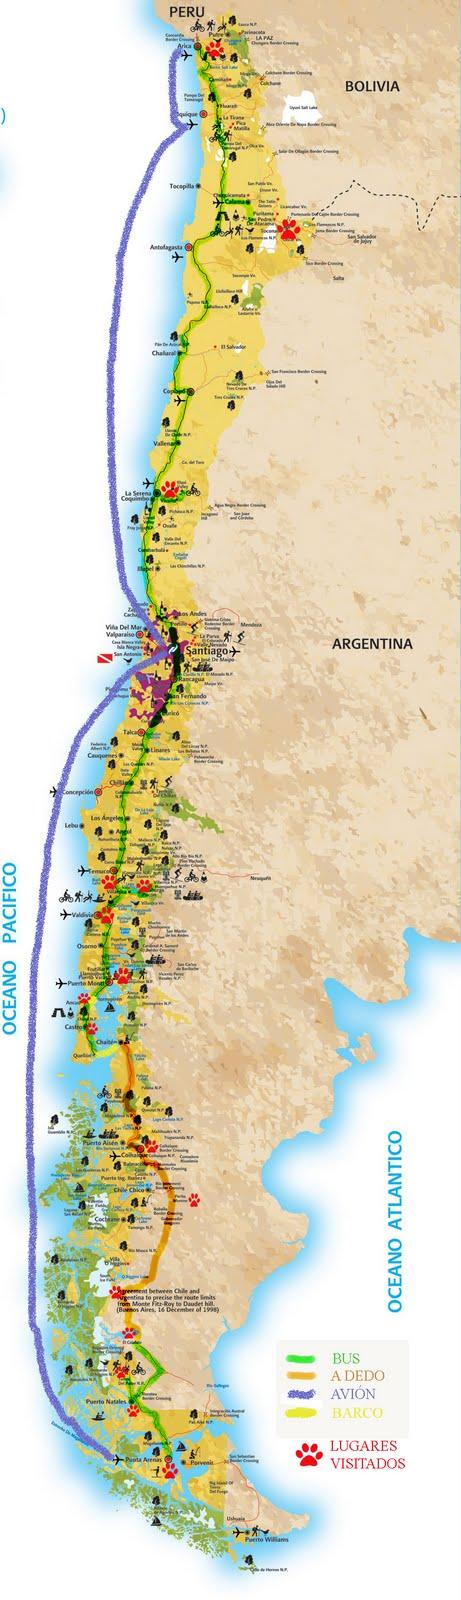 Mapa de Chile - Carte du Chili